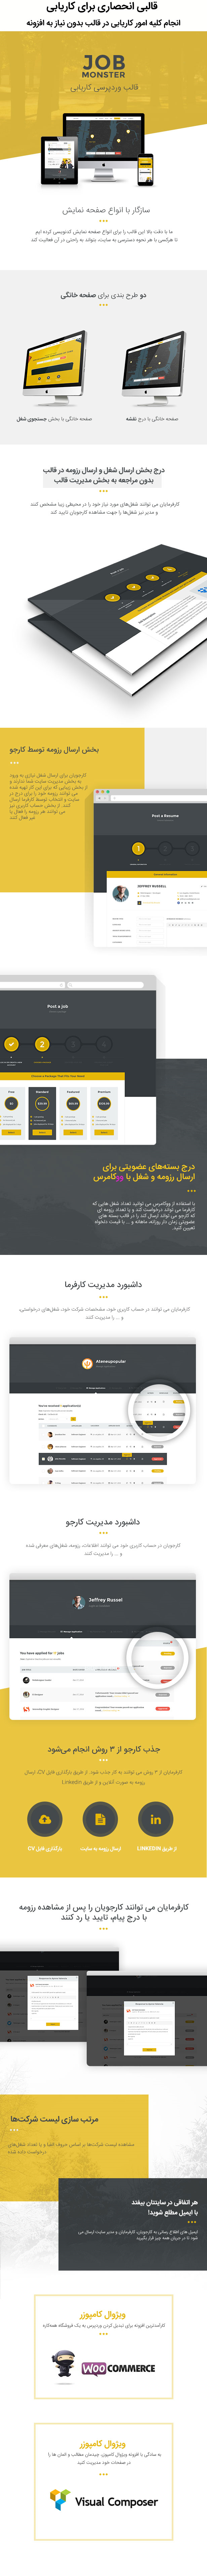 Jobmonster - Job Board WordPress Theme -2